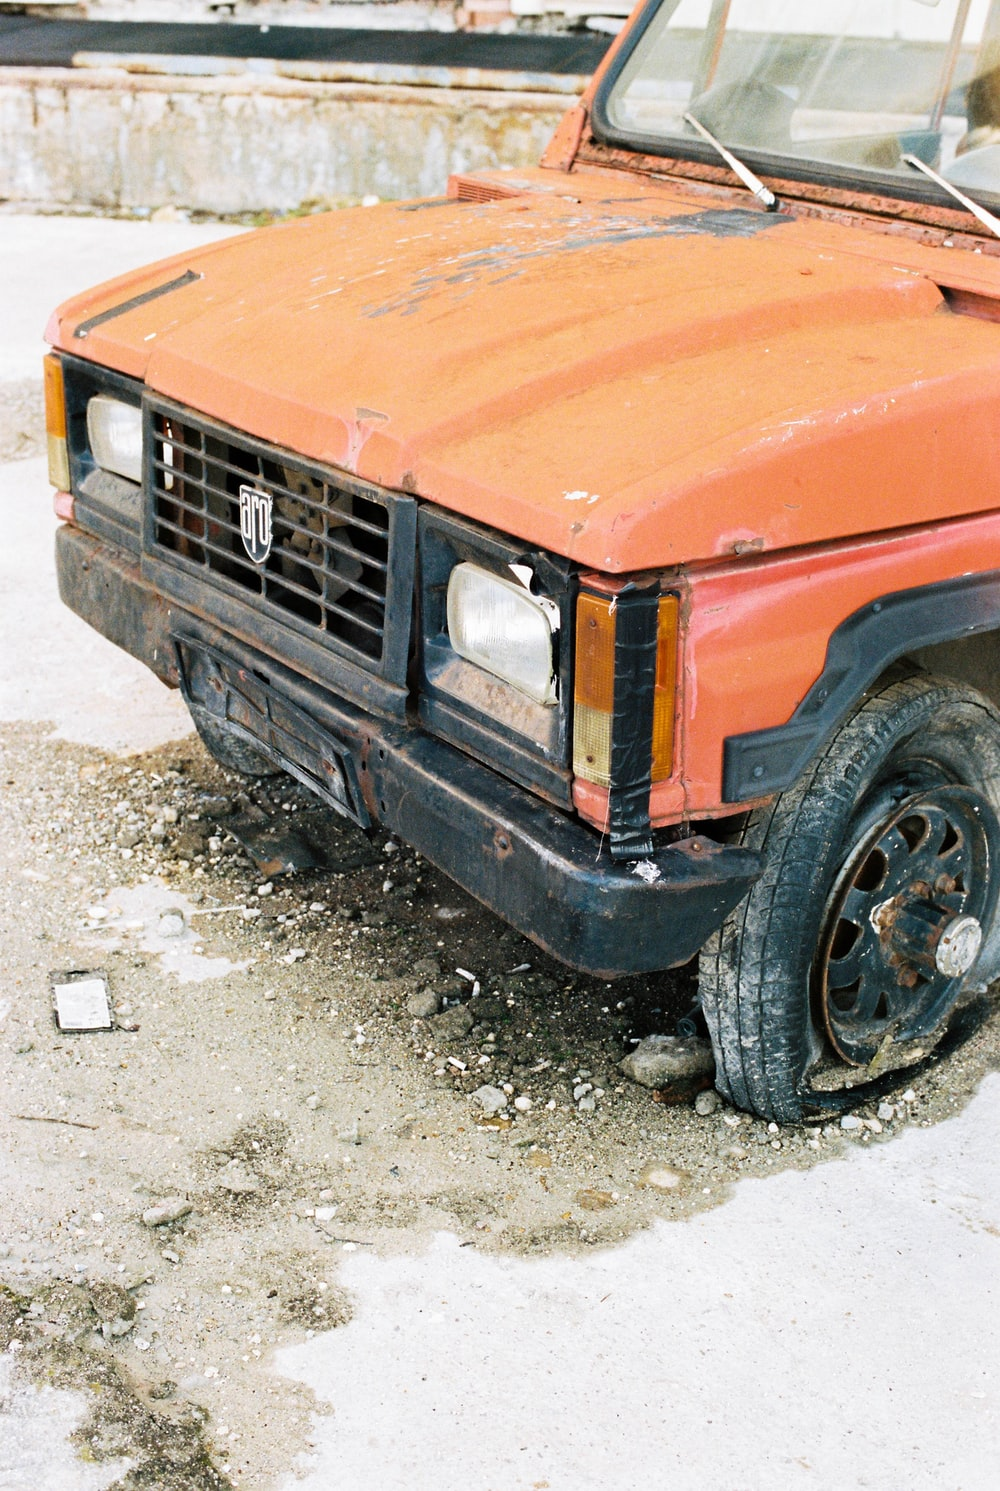 orange car on gray dirt ground